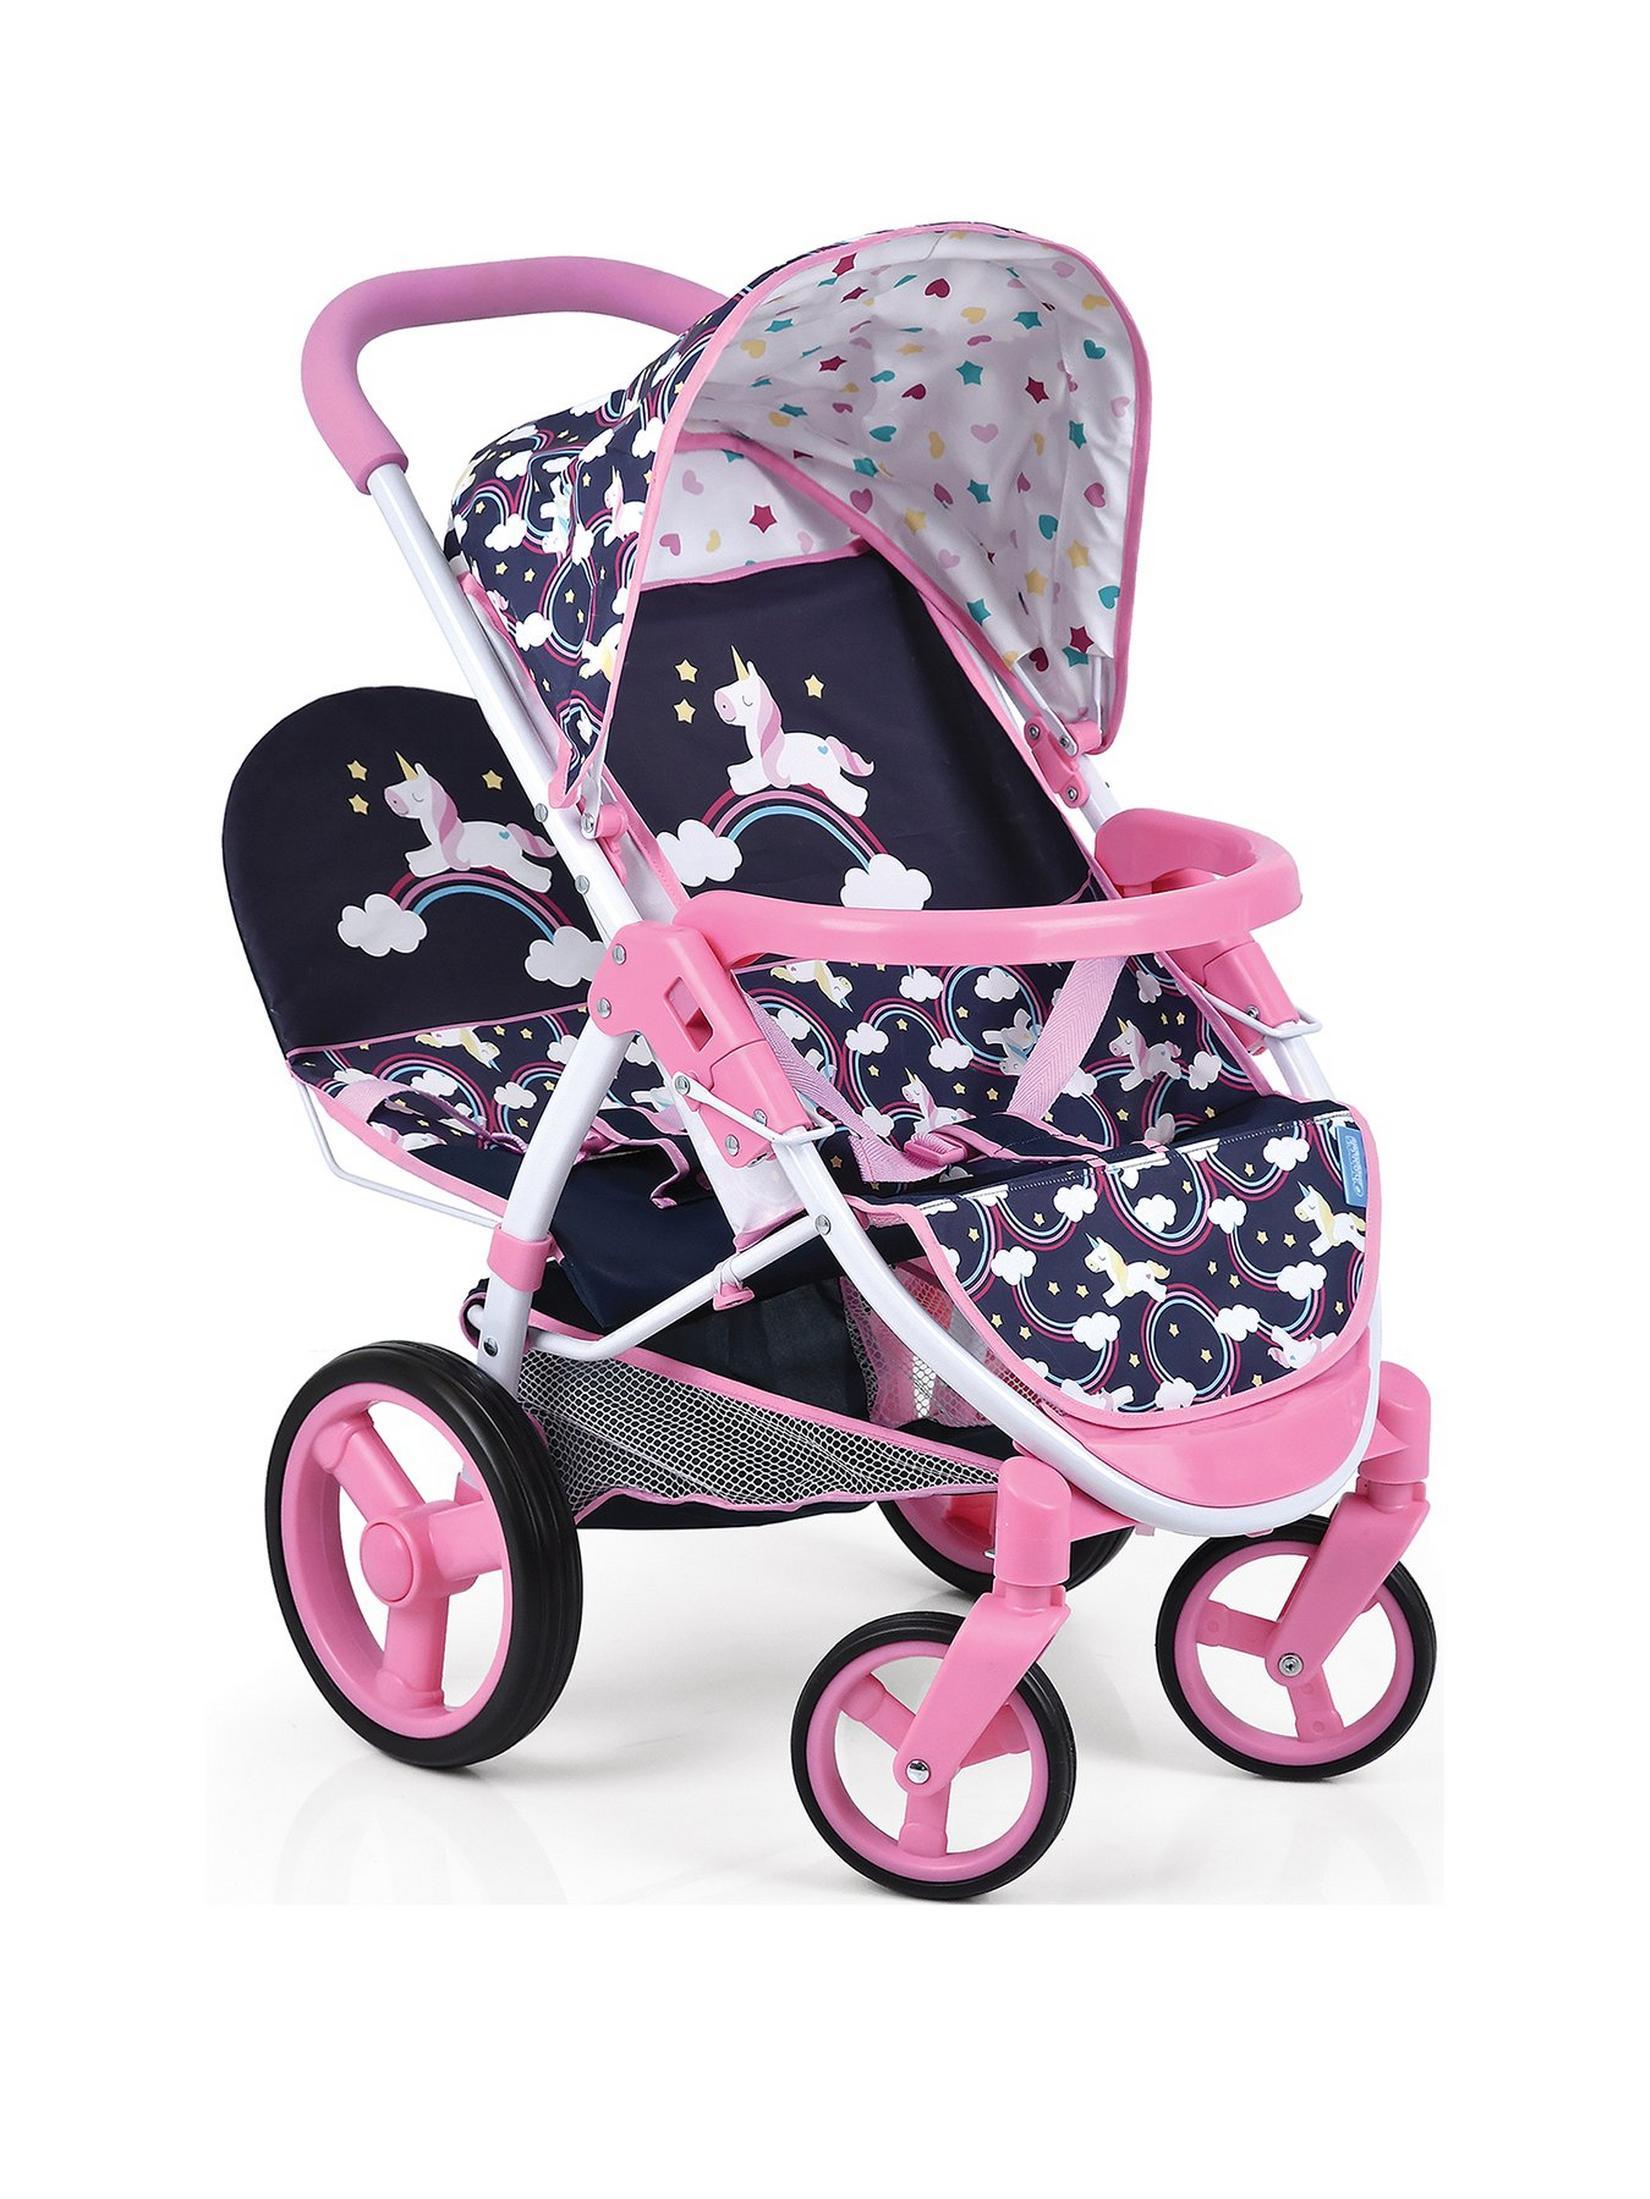 Hauck Unicorn Malibu Doll Twin Stroller £19.99 Free c & c @ Very